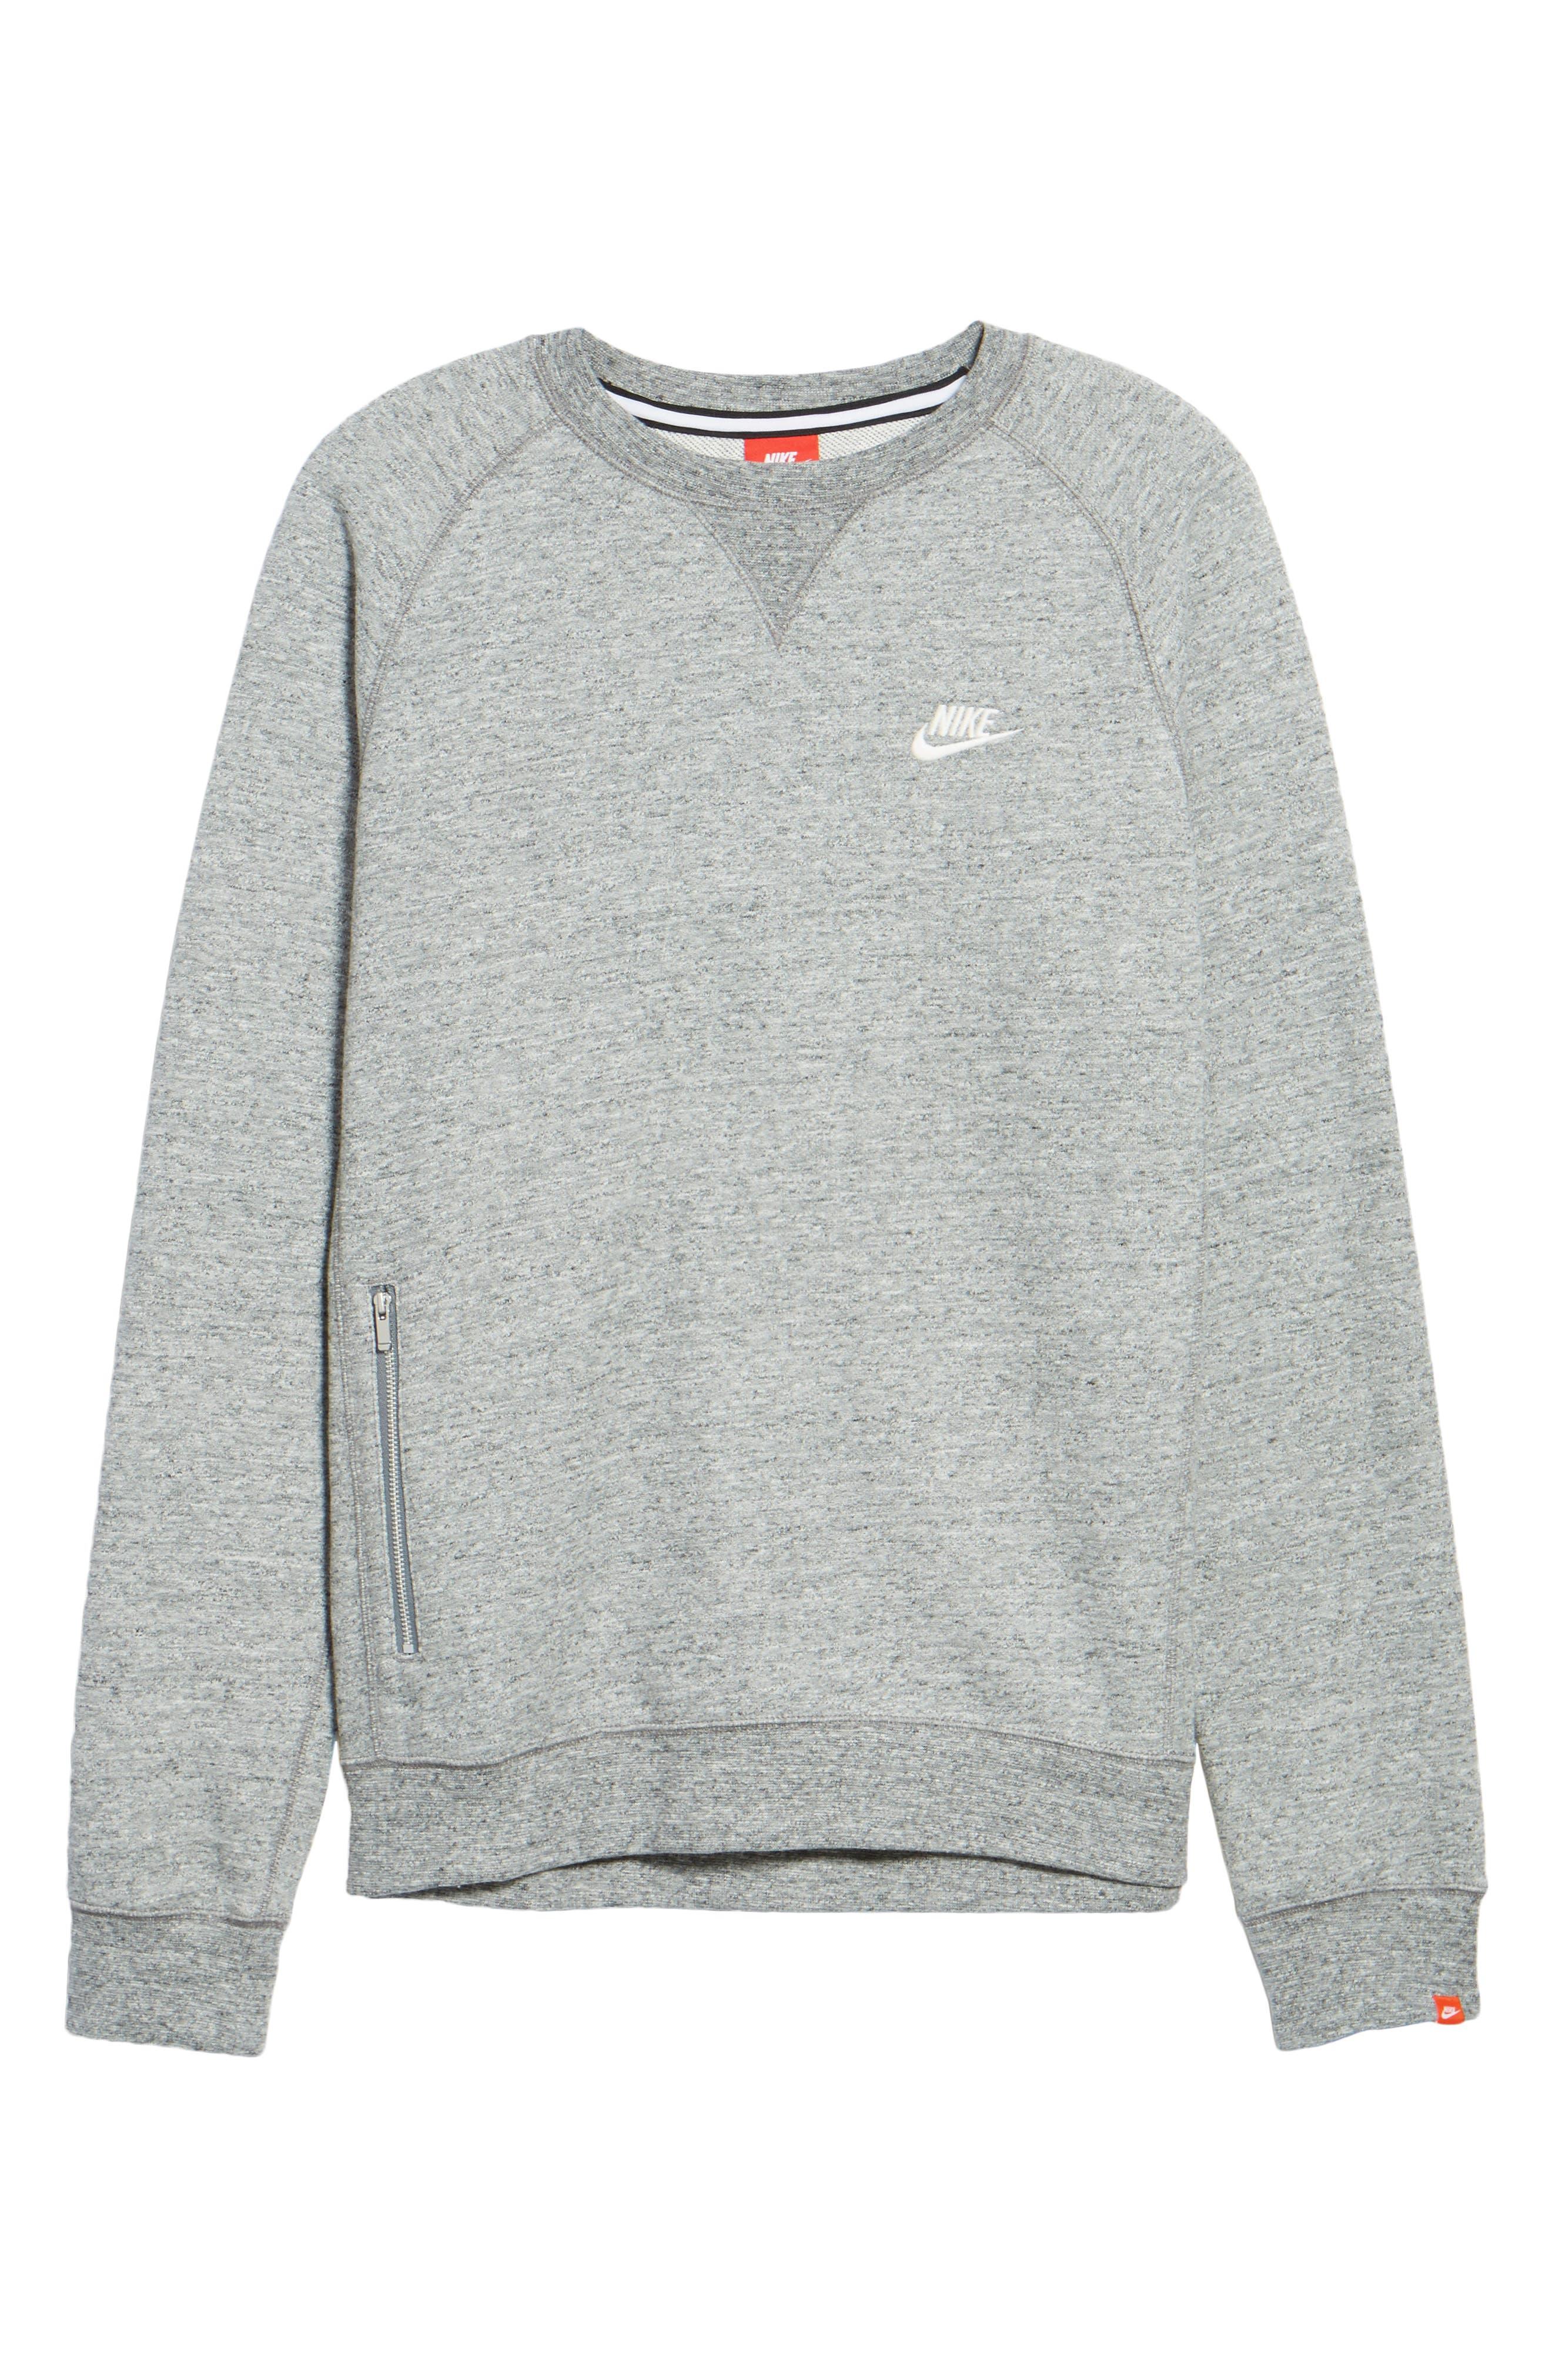 Legacy Raglan Crewneck Sweatshirt,                             Alternate thumbnail 6, color,                             092